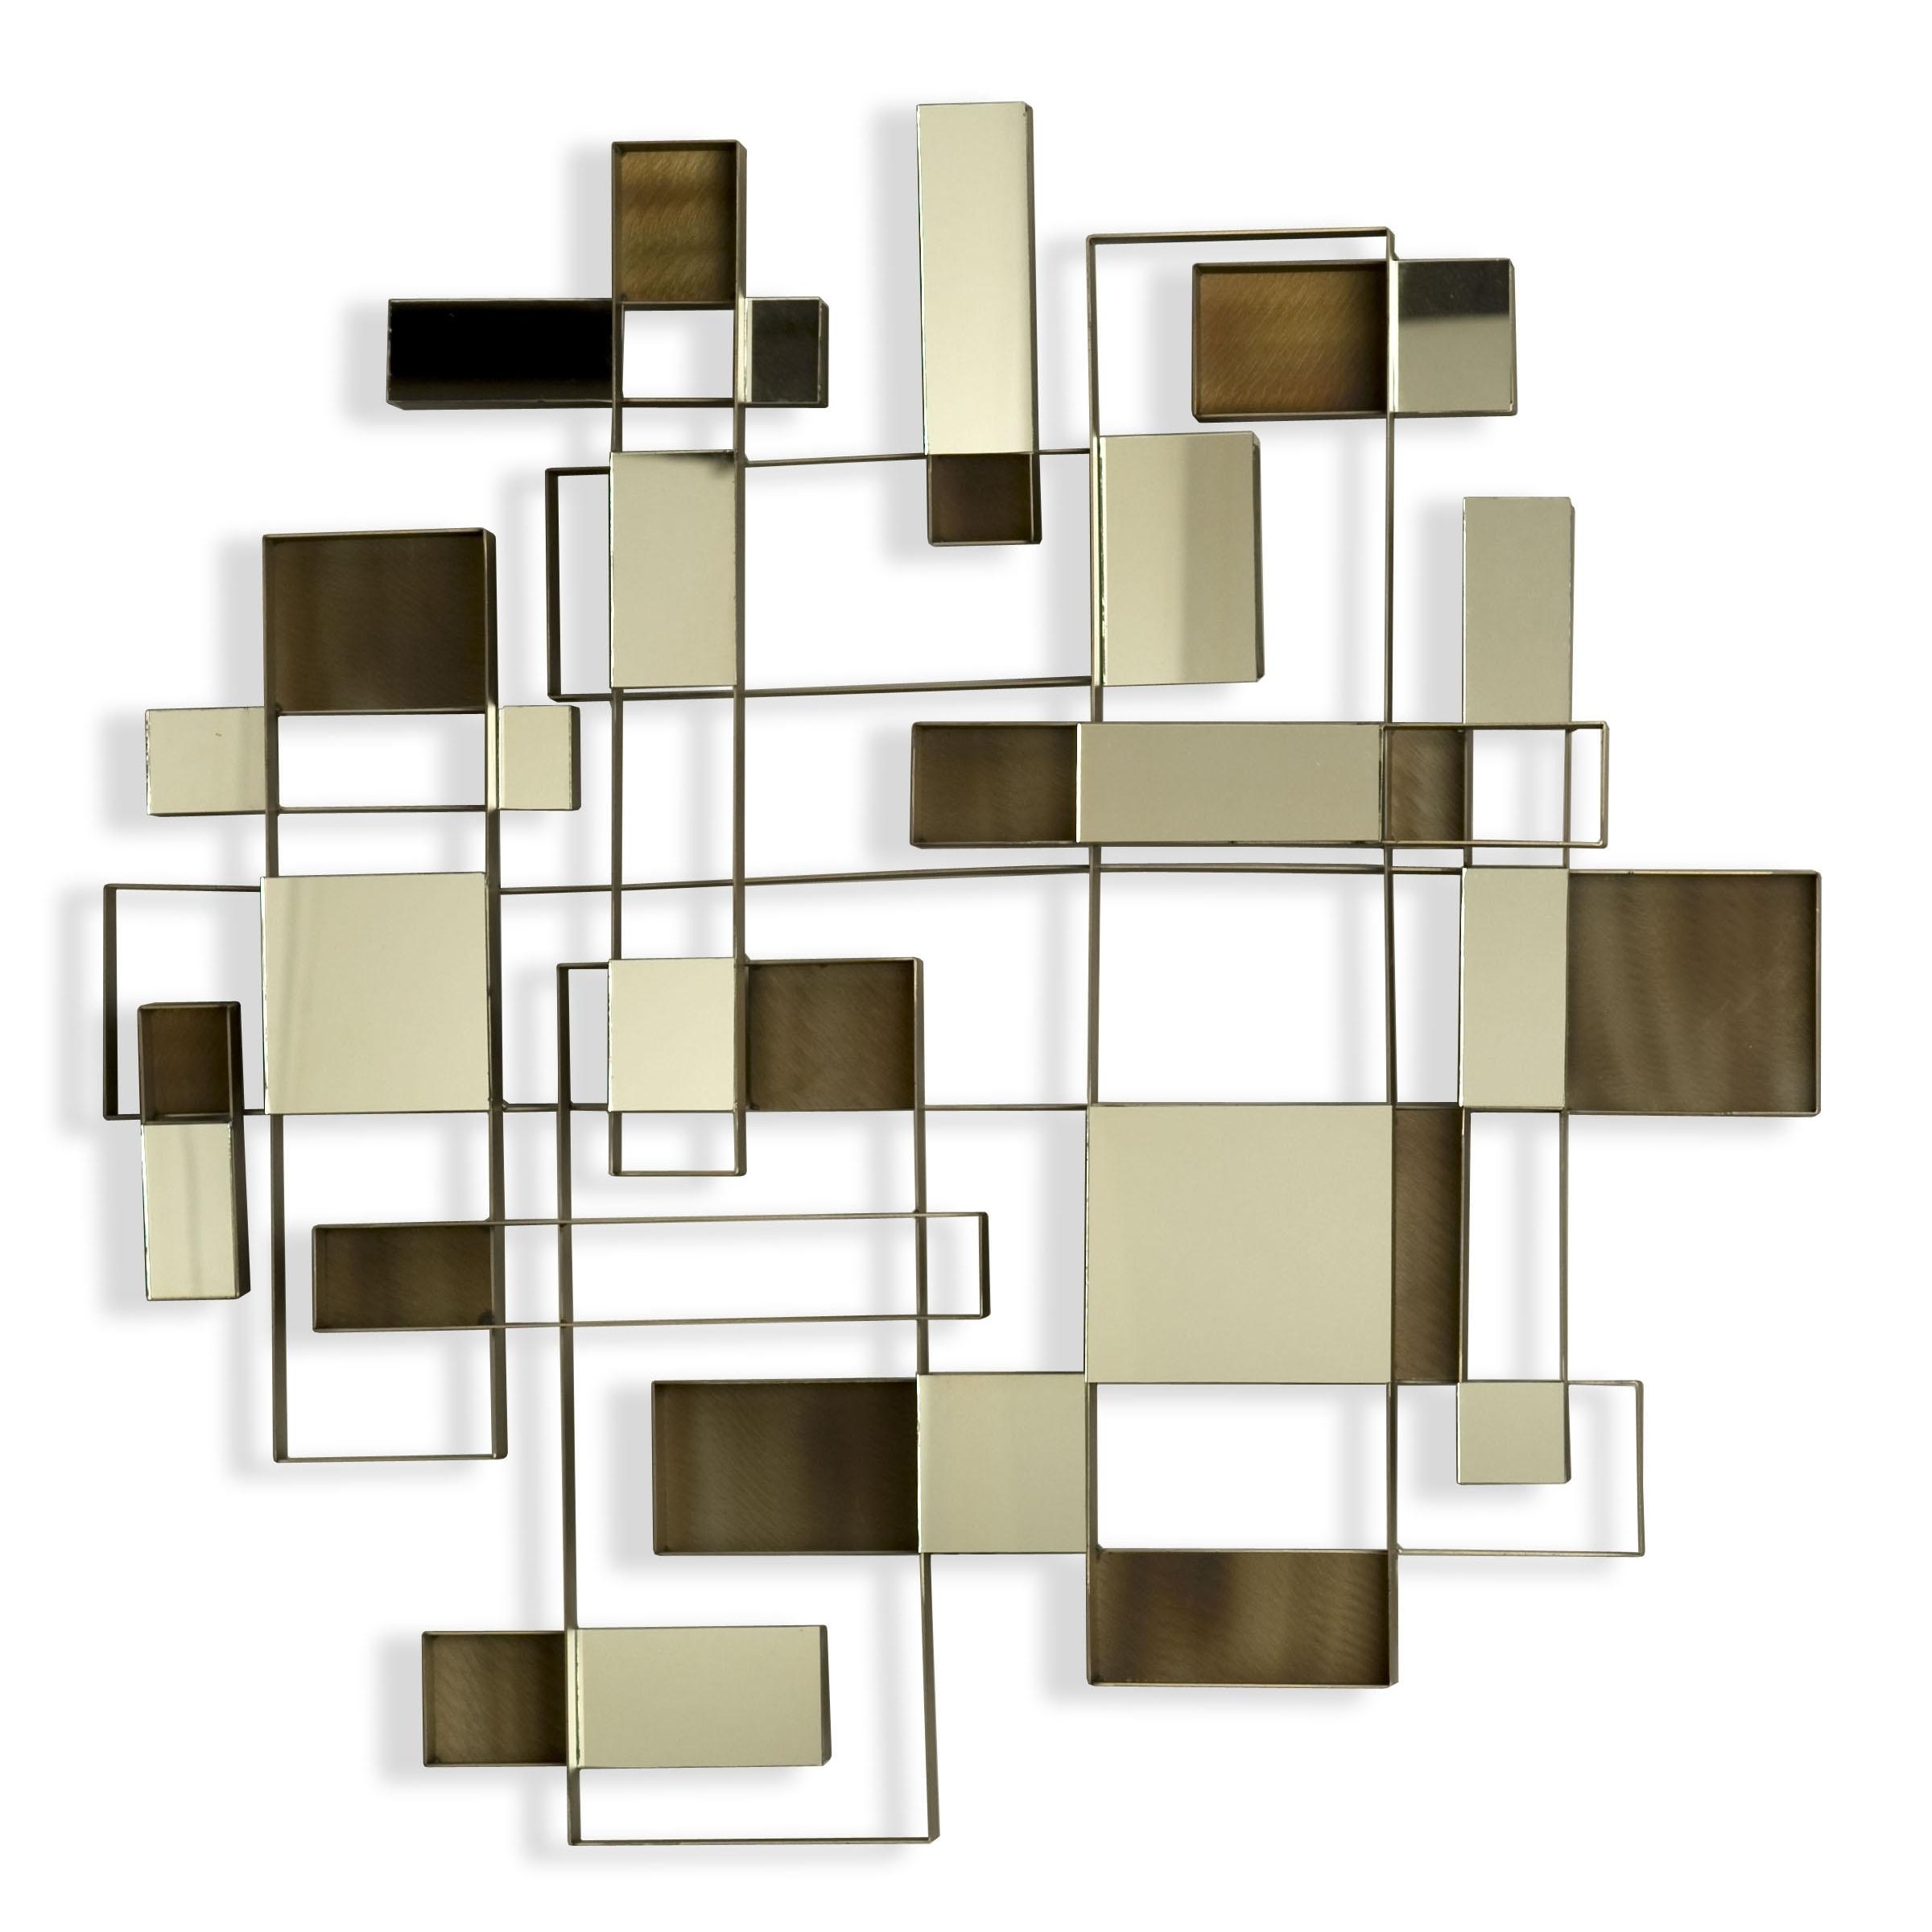 Wall Art Designs: Mirror Wall Art Nova Angles Wall Art Mirror Intended For 2018 Rectangular Canvas Wall Art (View 11 of 15)